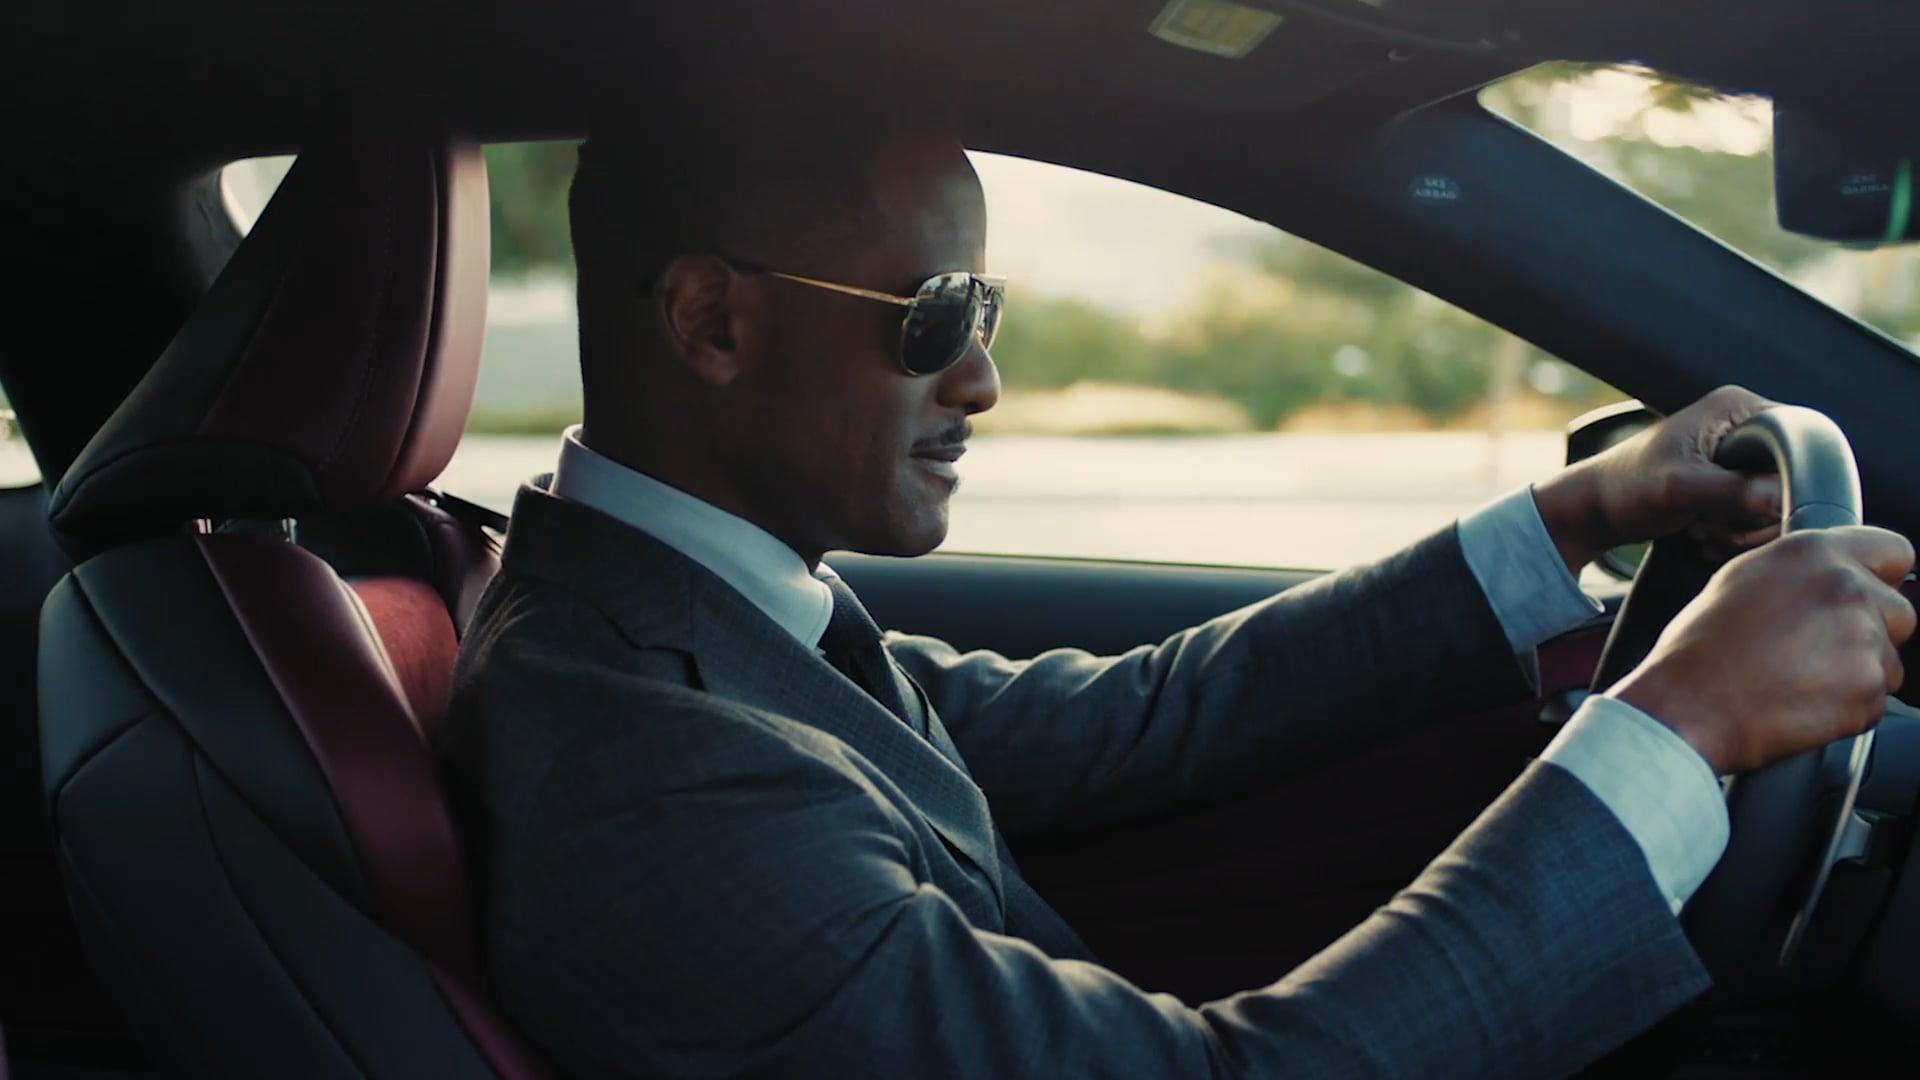 Lexus - Custom Fit ft. Blair Underwood